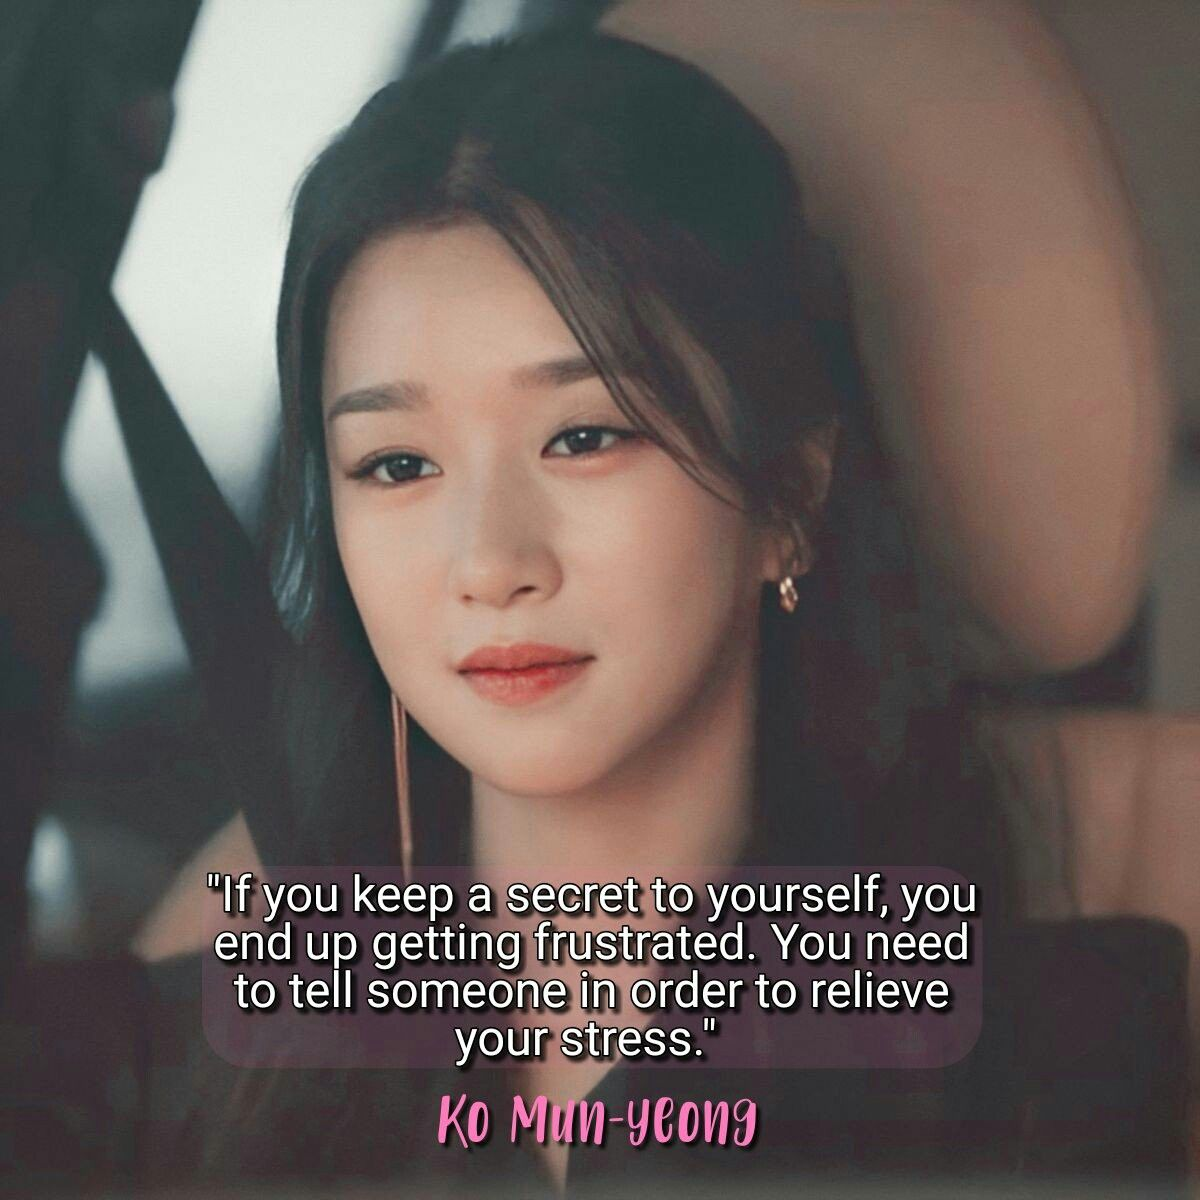 It's Okay To Not Be Okay | Ko Mun-yeong